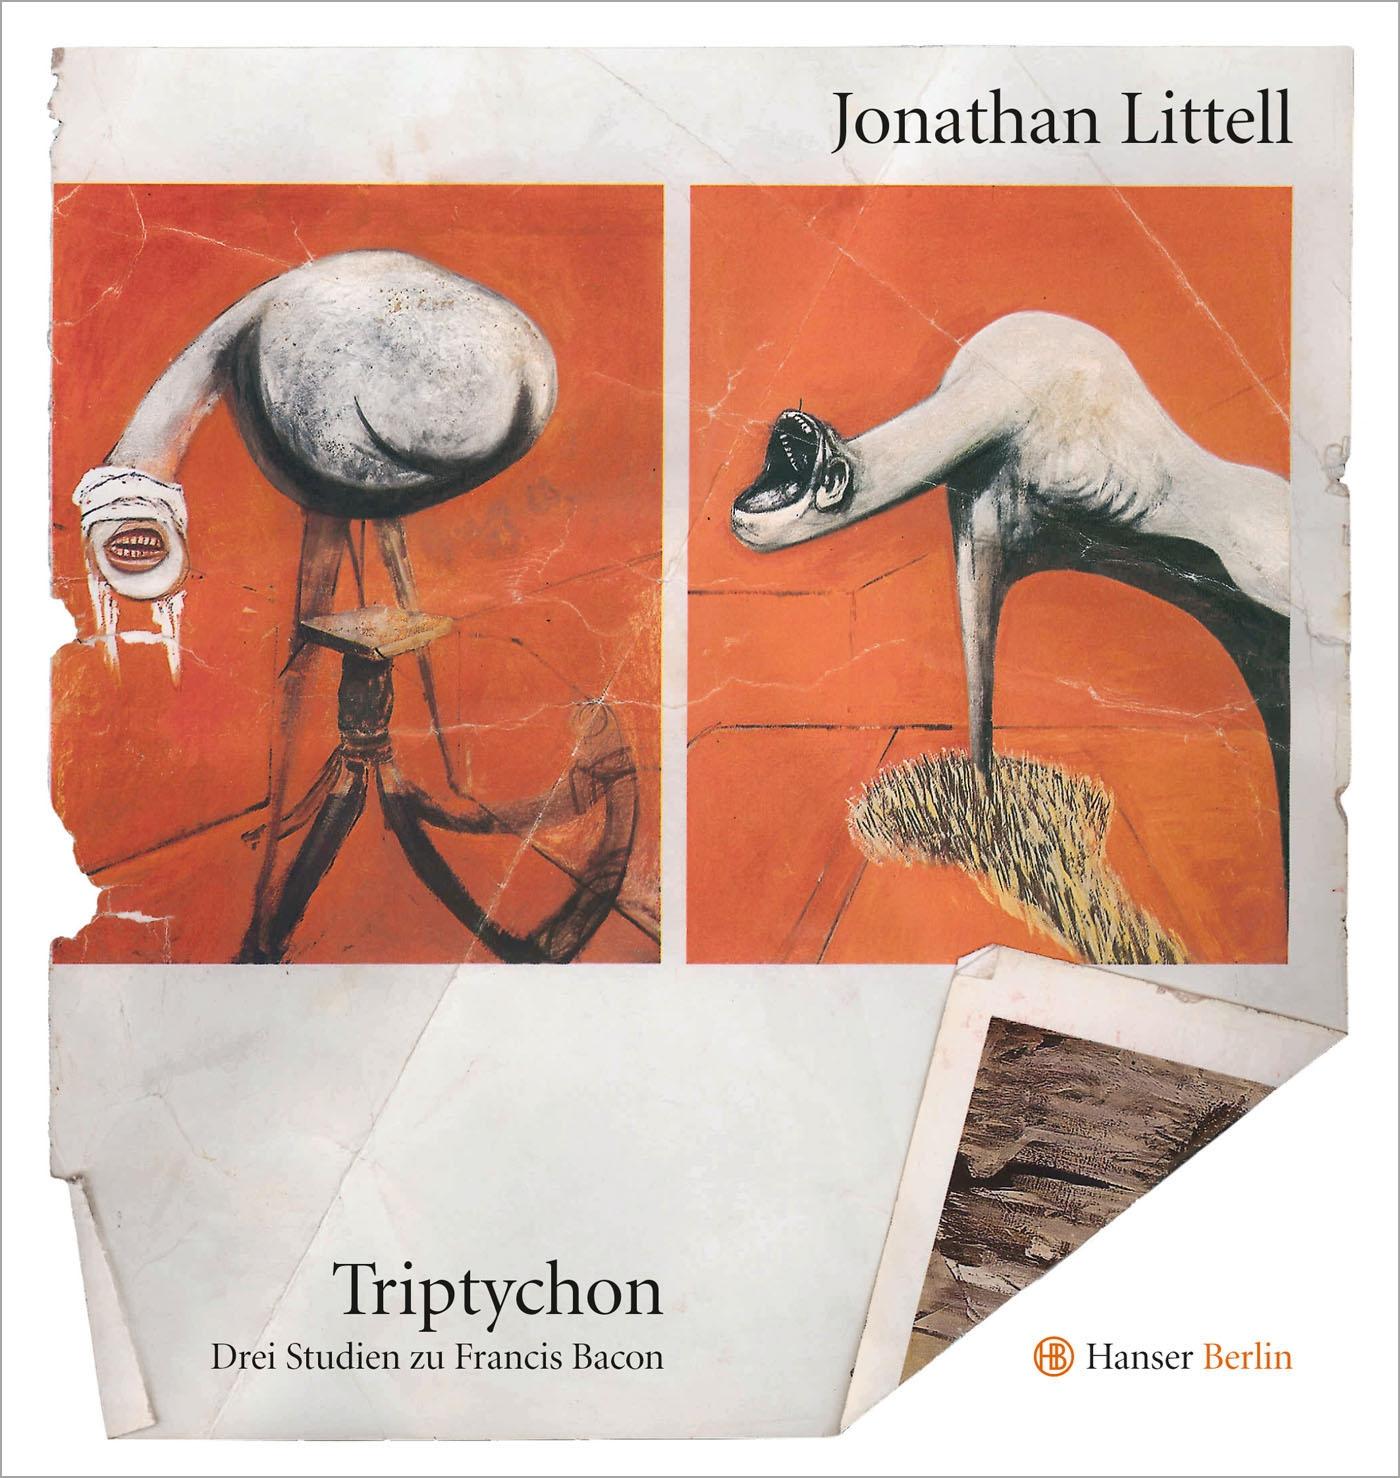 Triptychon